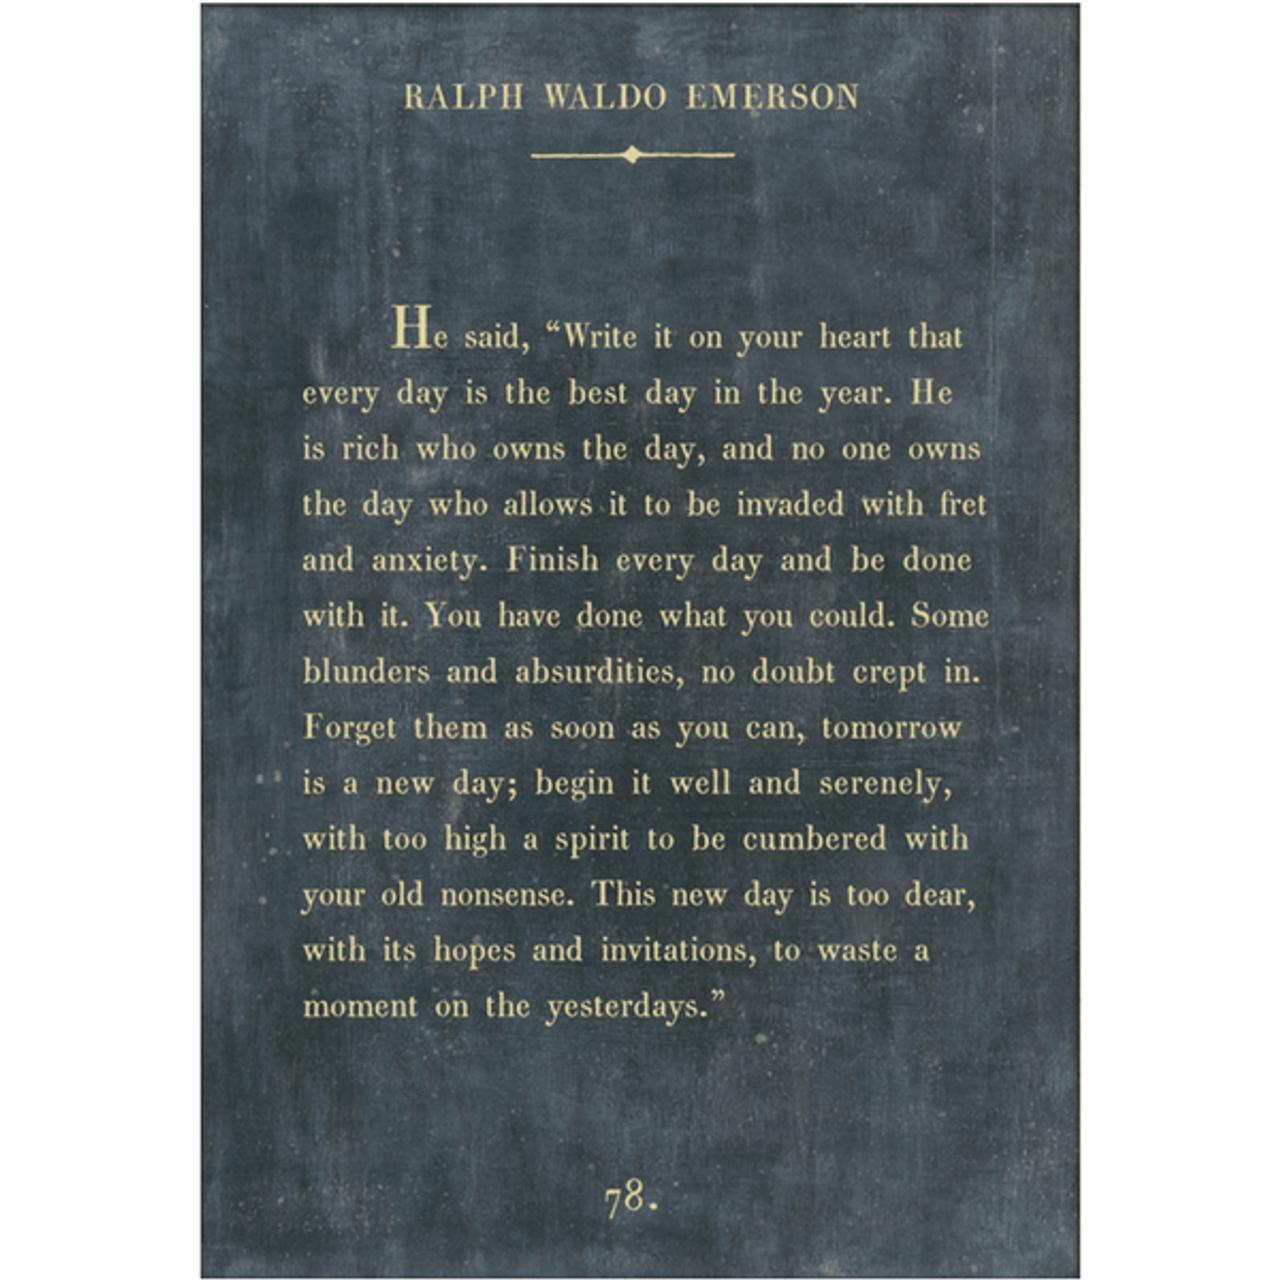 ralph waldo emerson art print - charcoal with gallery wrap frame